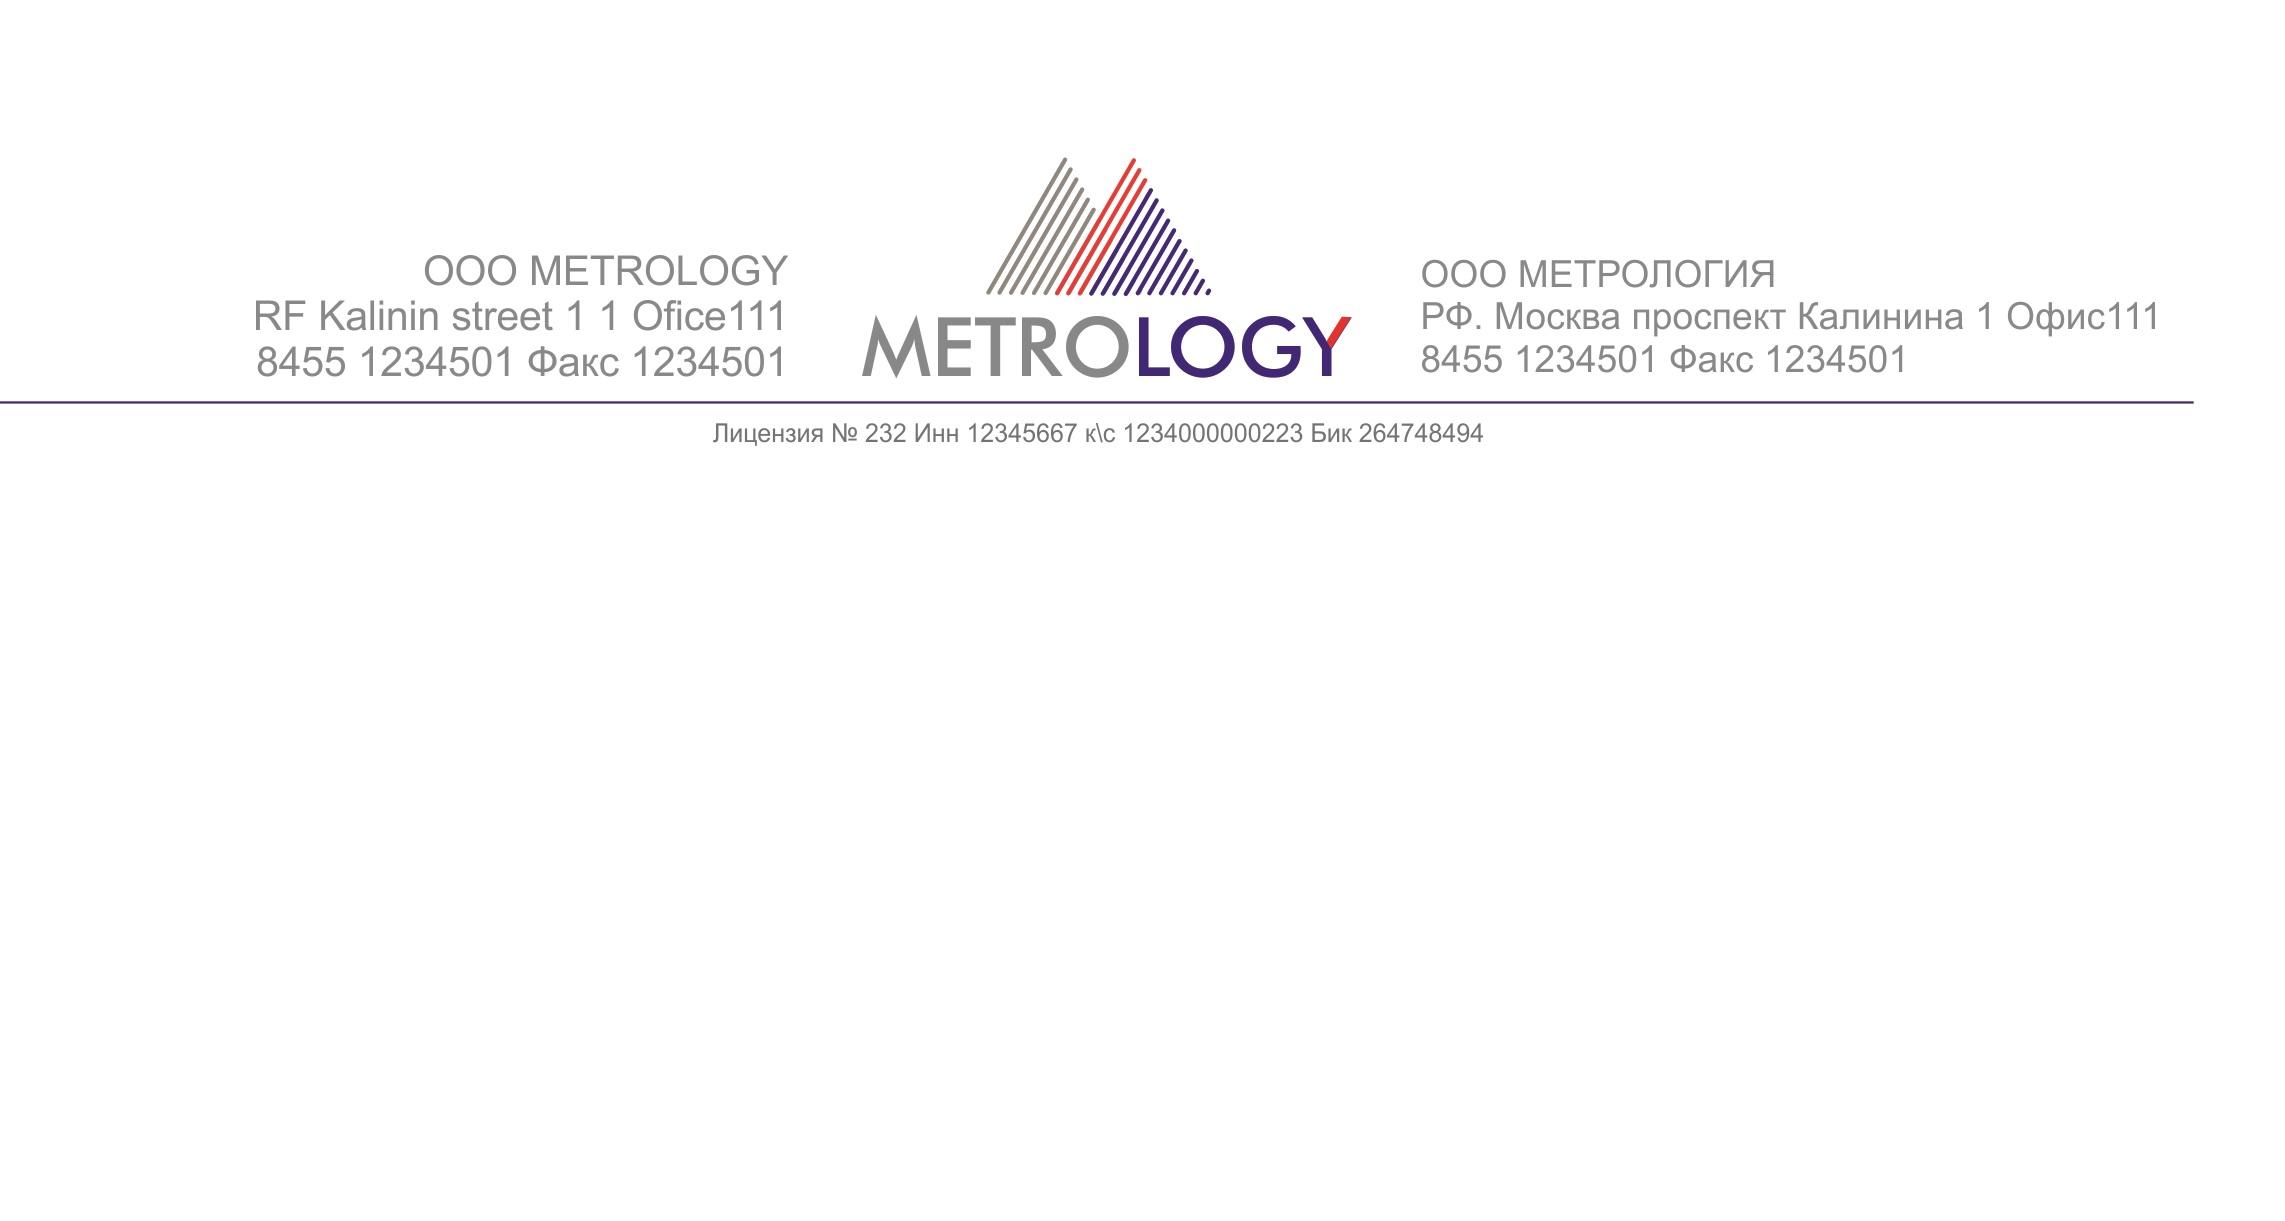 Разработать логотип, визитку, фирменный бланк. фото f_30858ff5fa35ae22.jpg